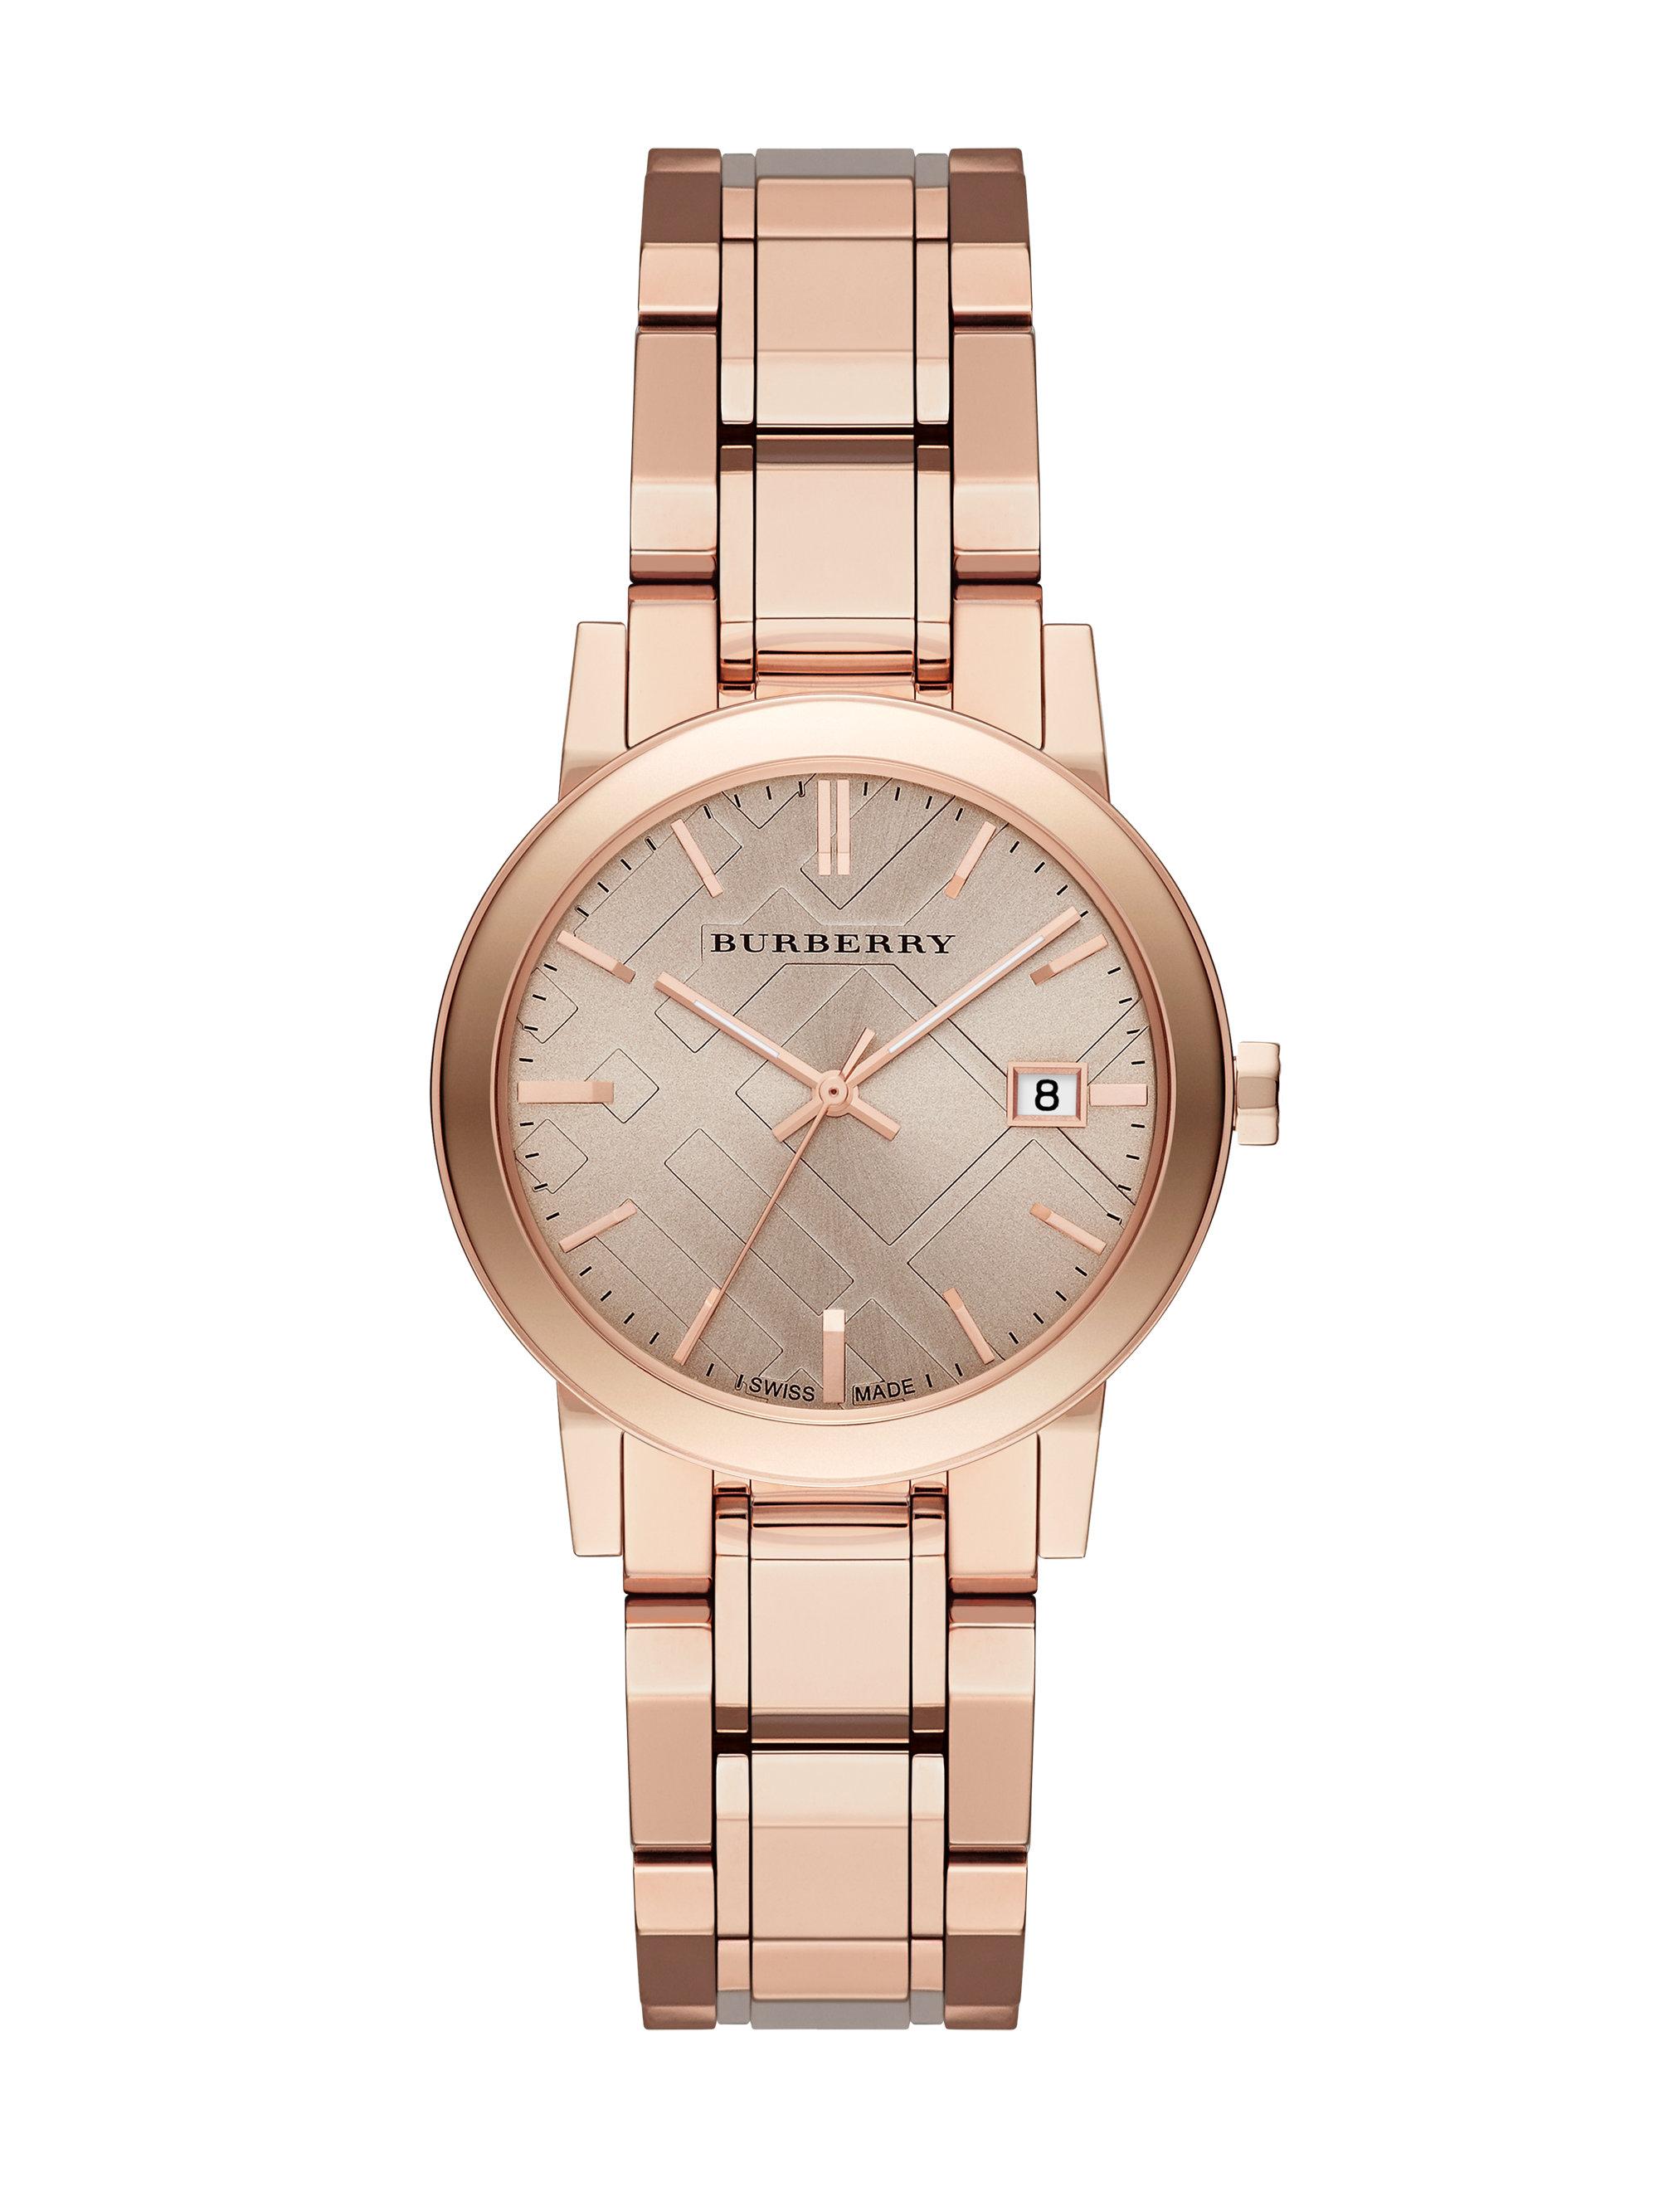 burberry watch 34mm